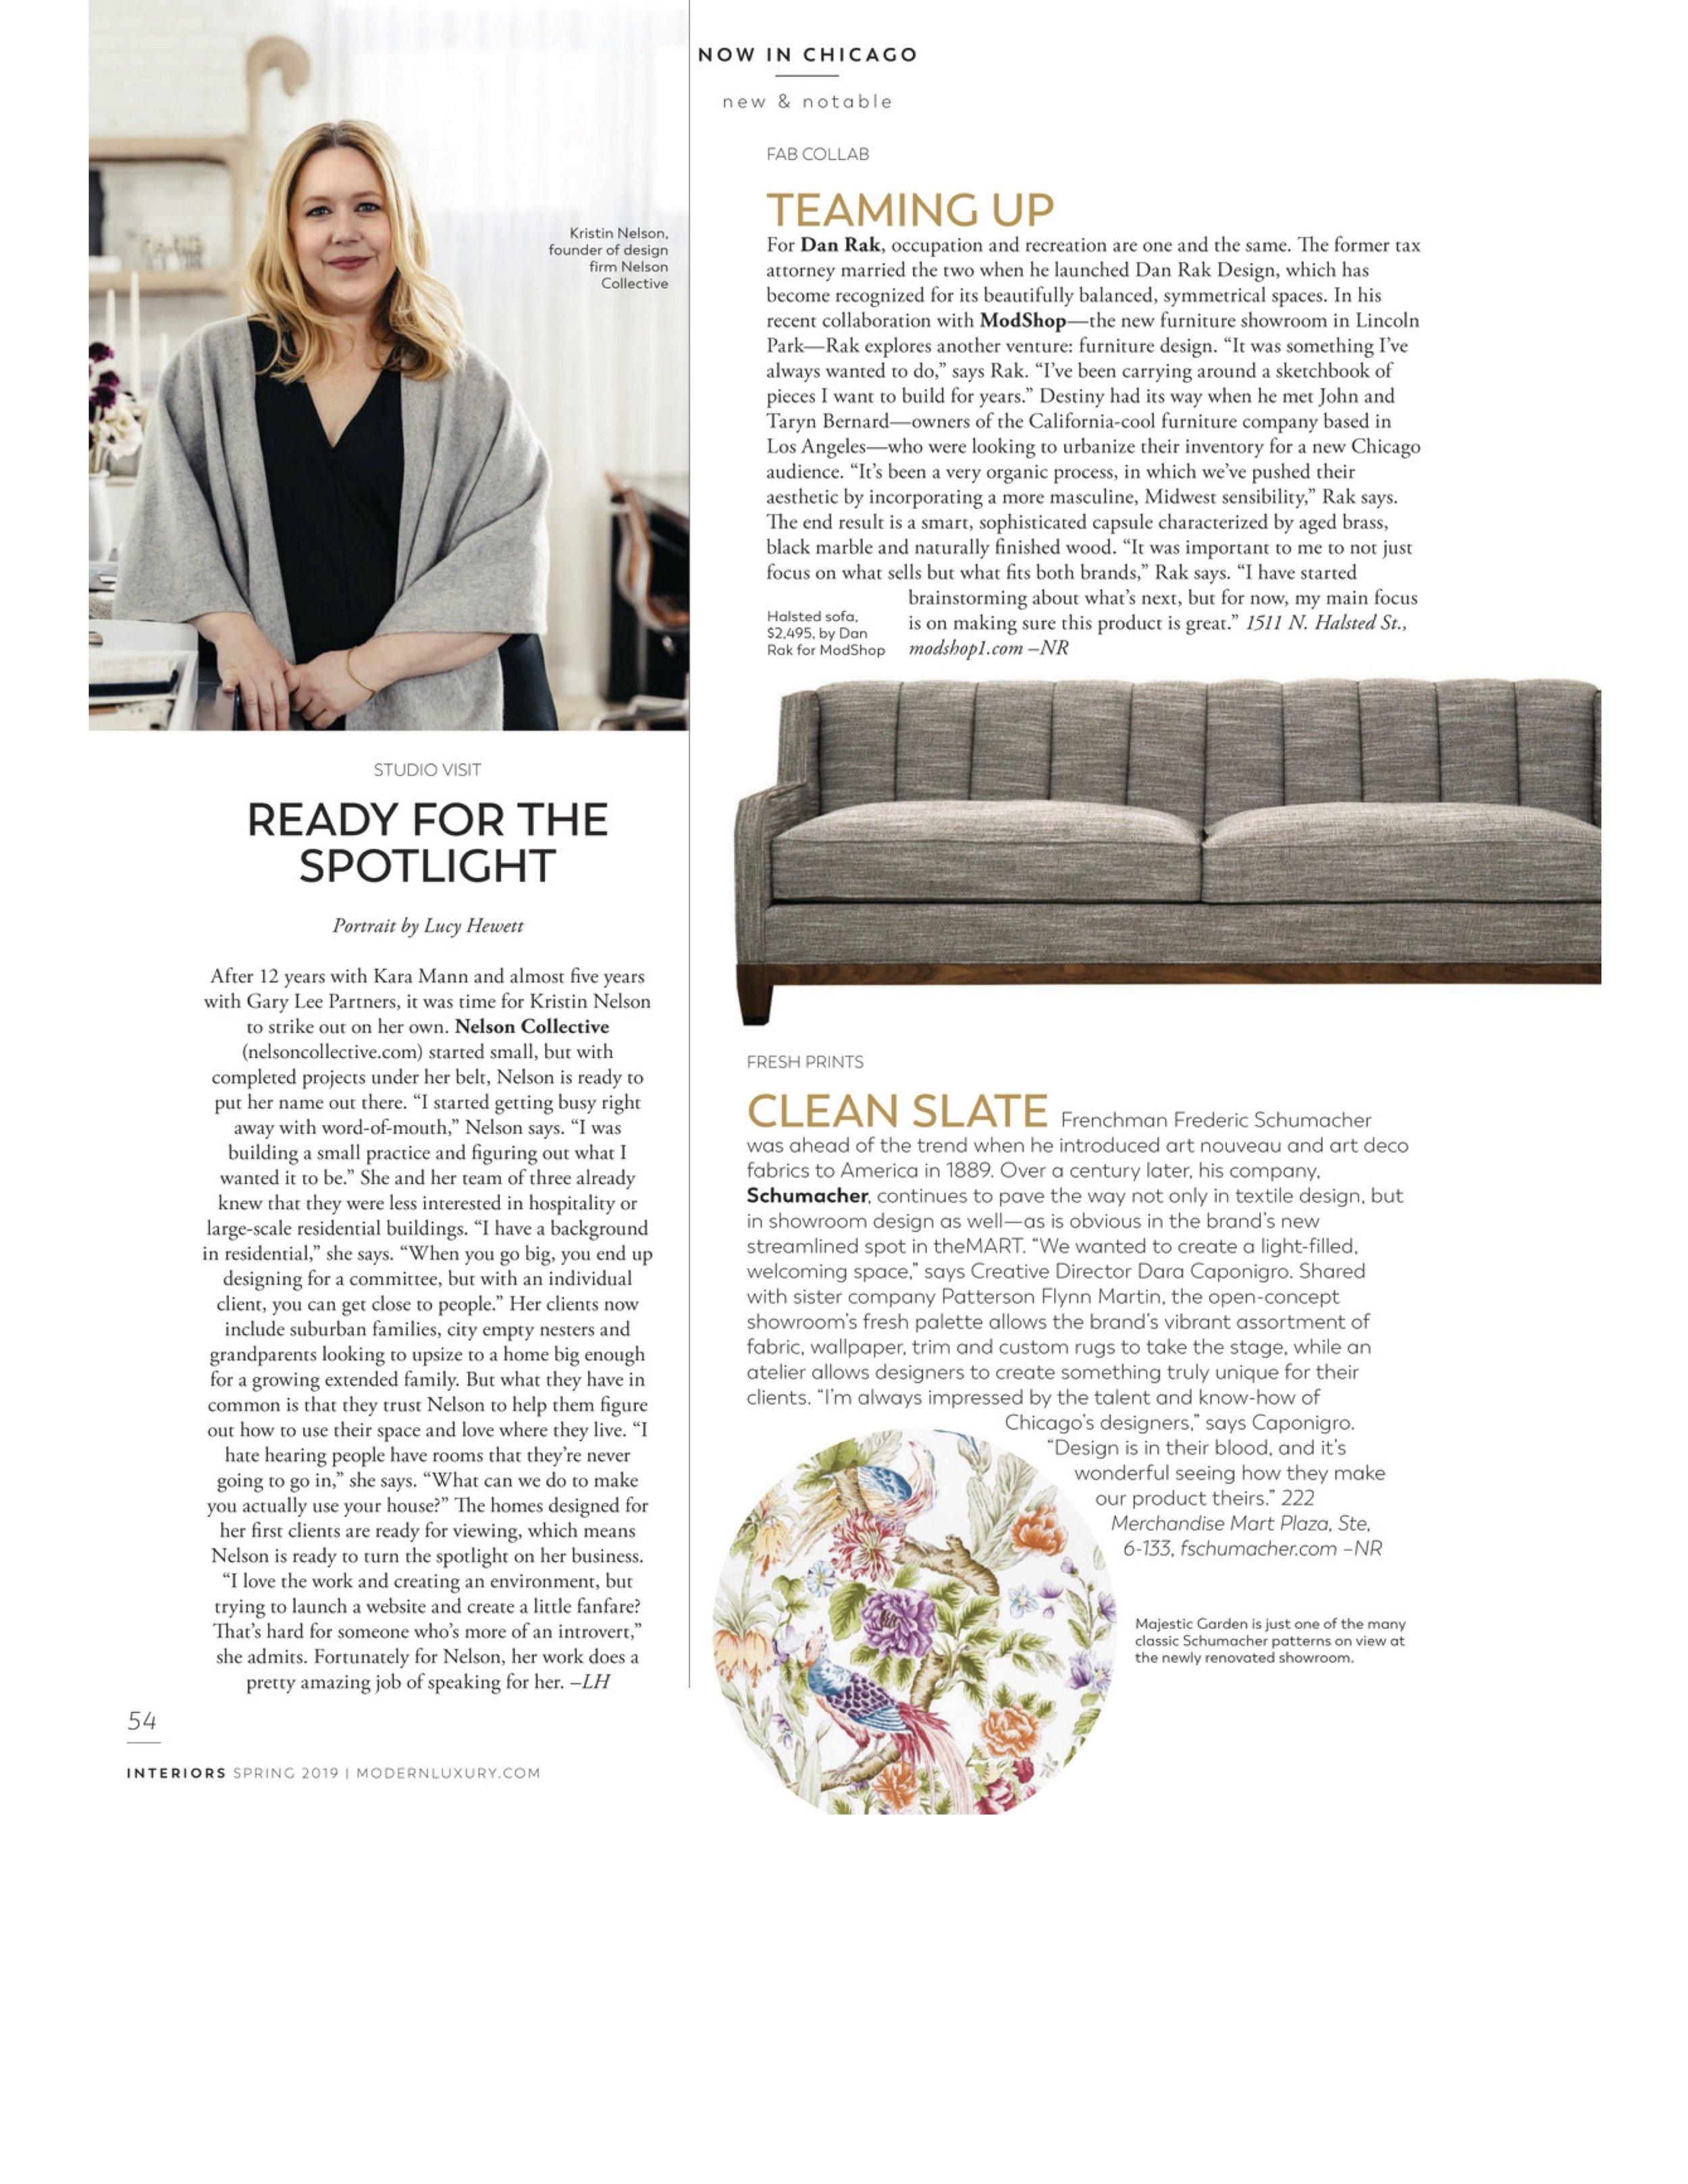 2 Modern Luxury Interiors Chicago Digital Edition | Modern Luxury.jpg